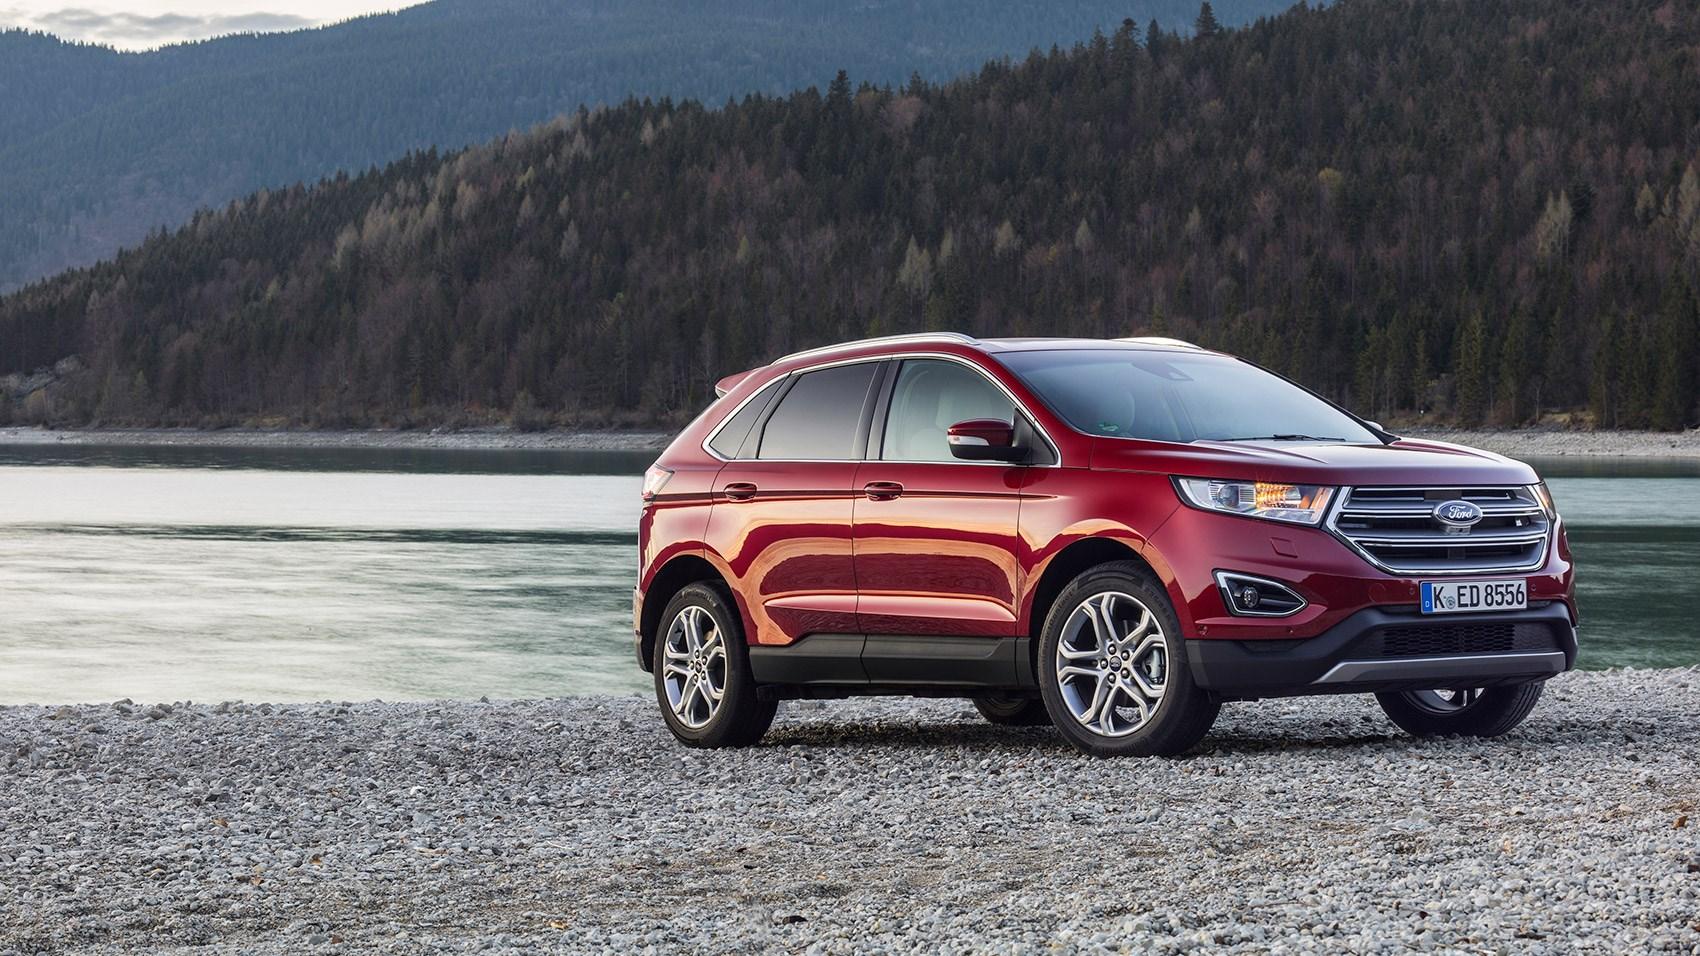 Ford Edge 2.0 TDCi Titanium Powershift (2016) review by CAR Magazine